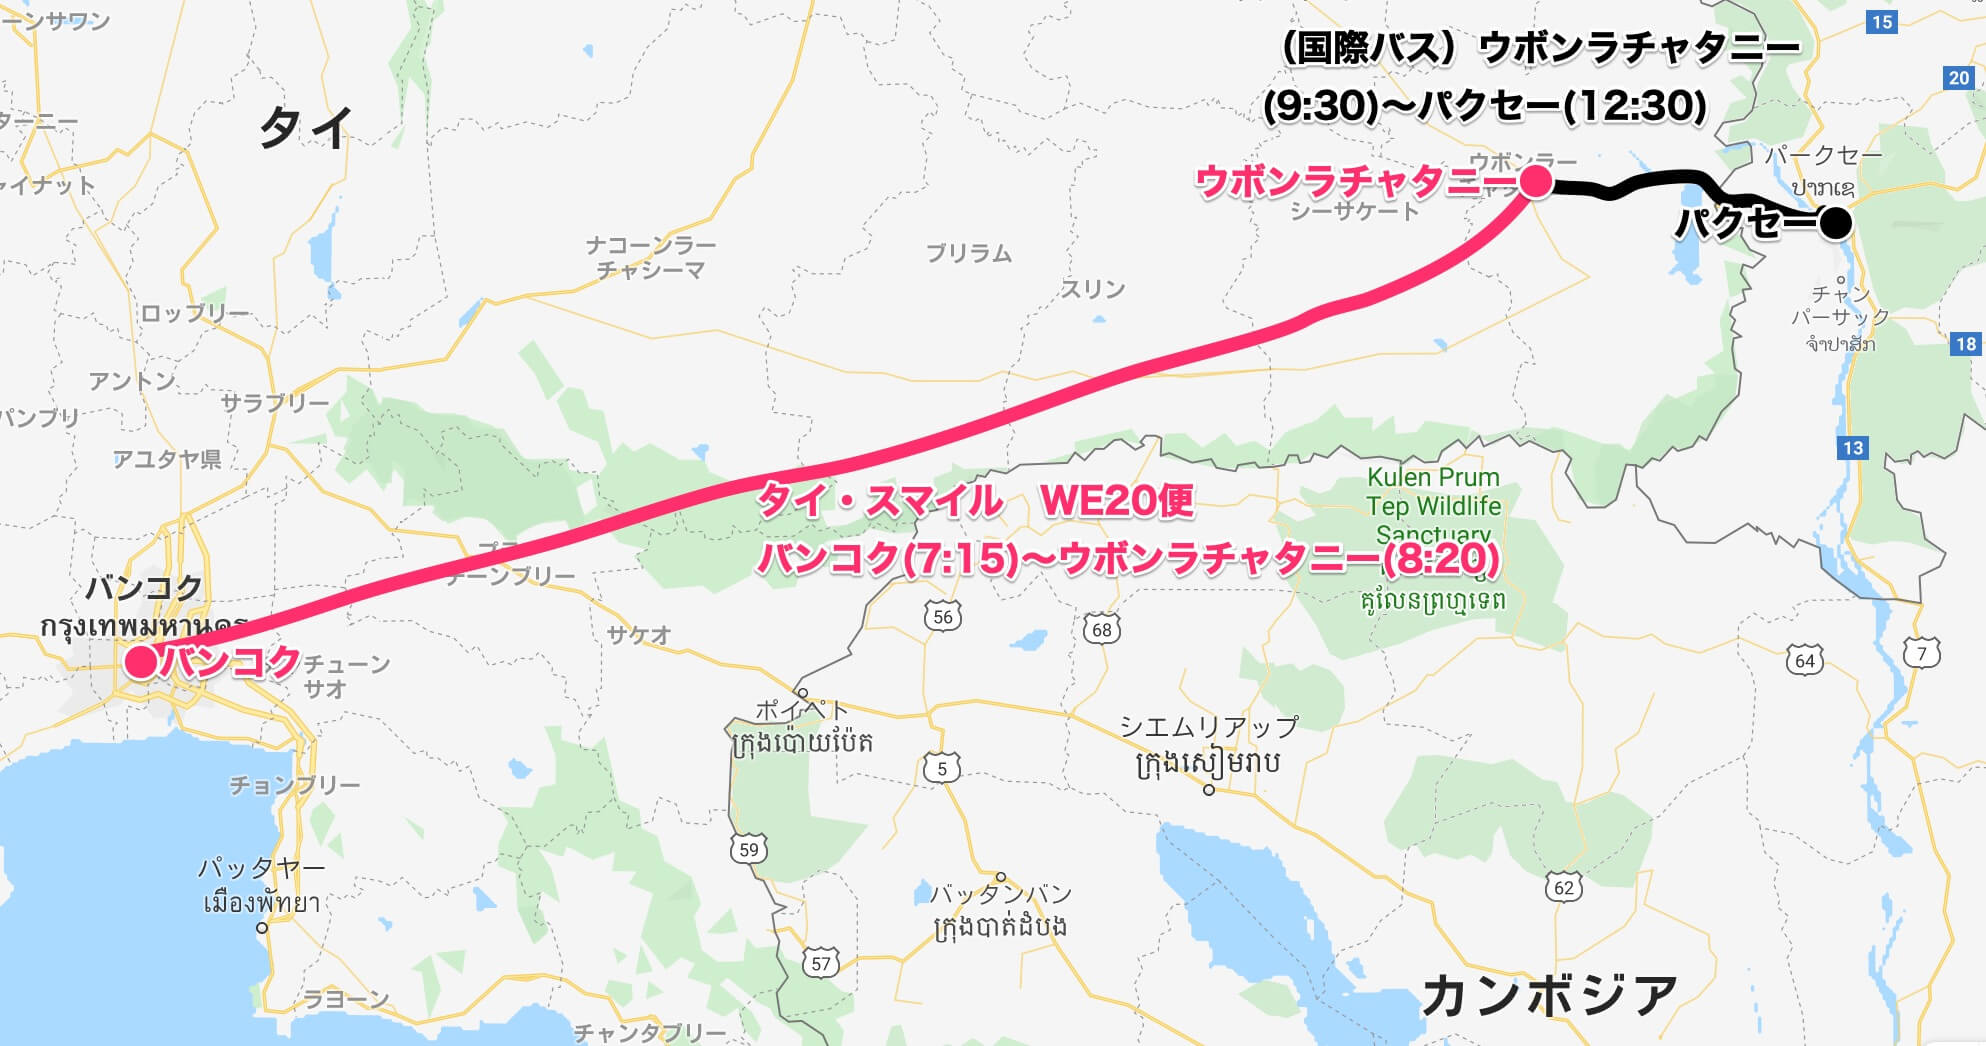 MAP1バンコク〜パクセー(国境越え)【タイ・ラオス②】